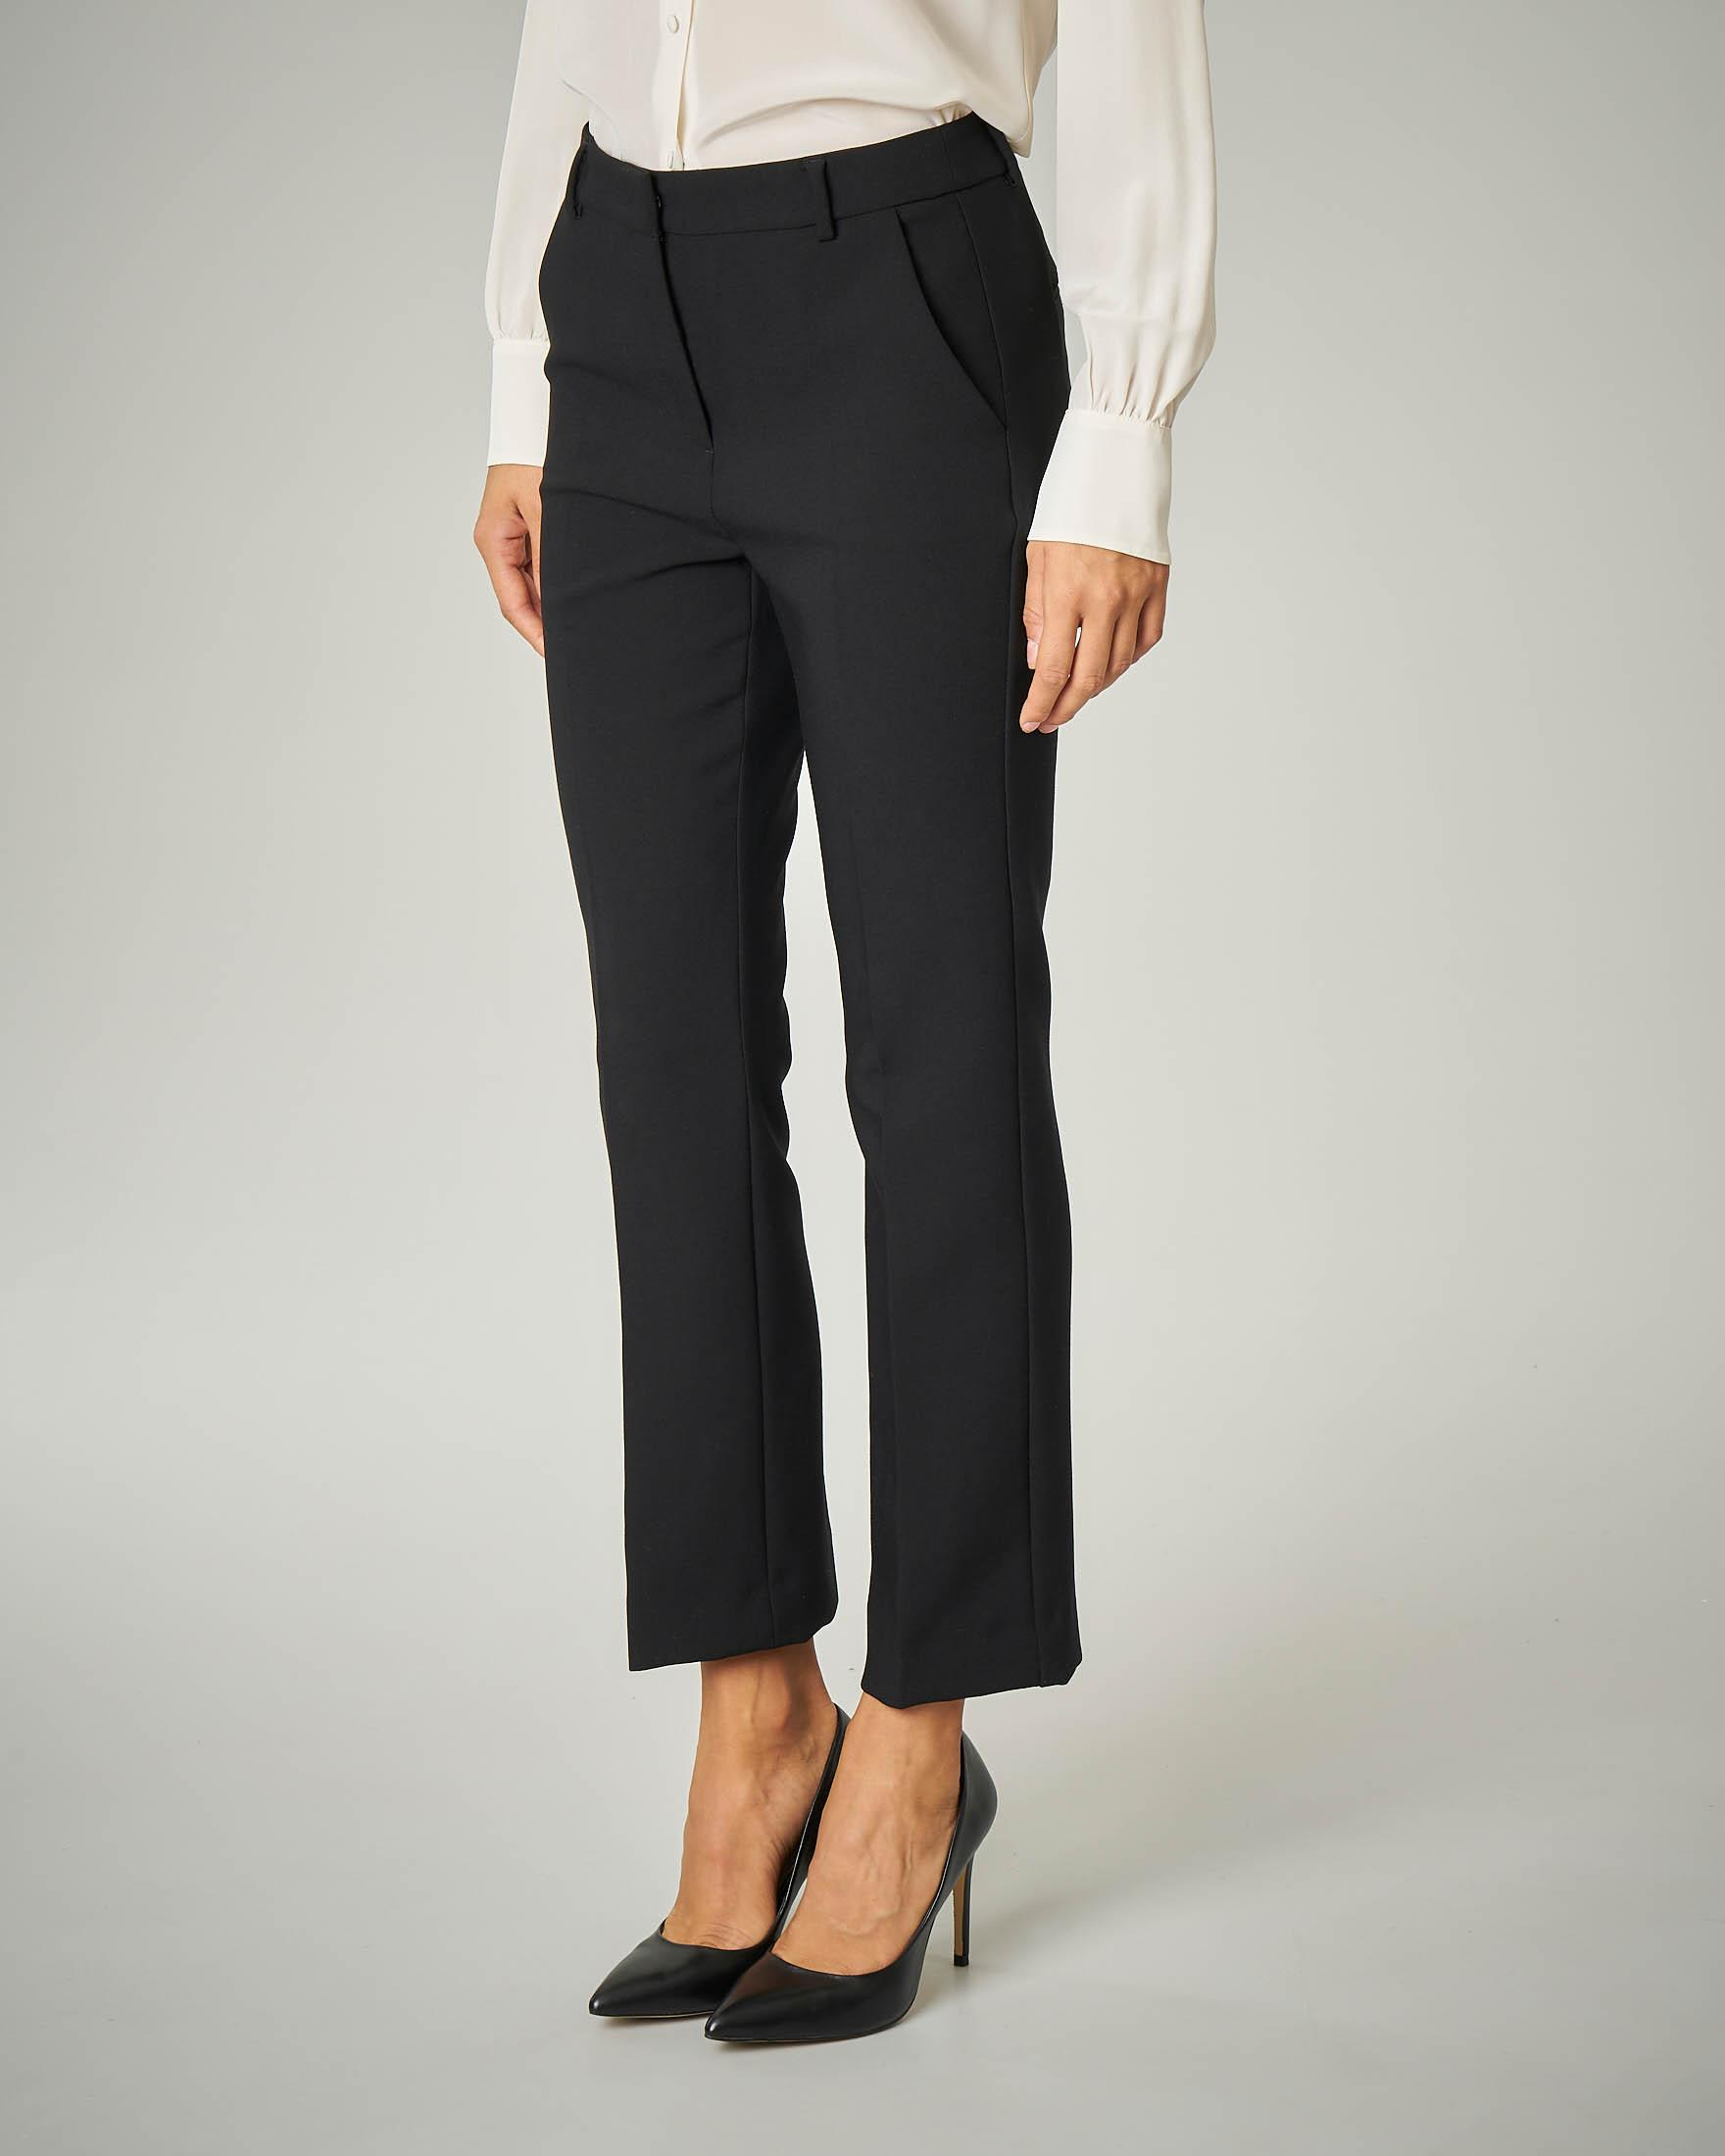 Pantalone nero in cady